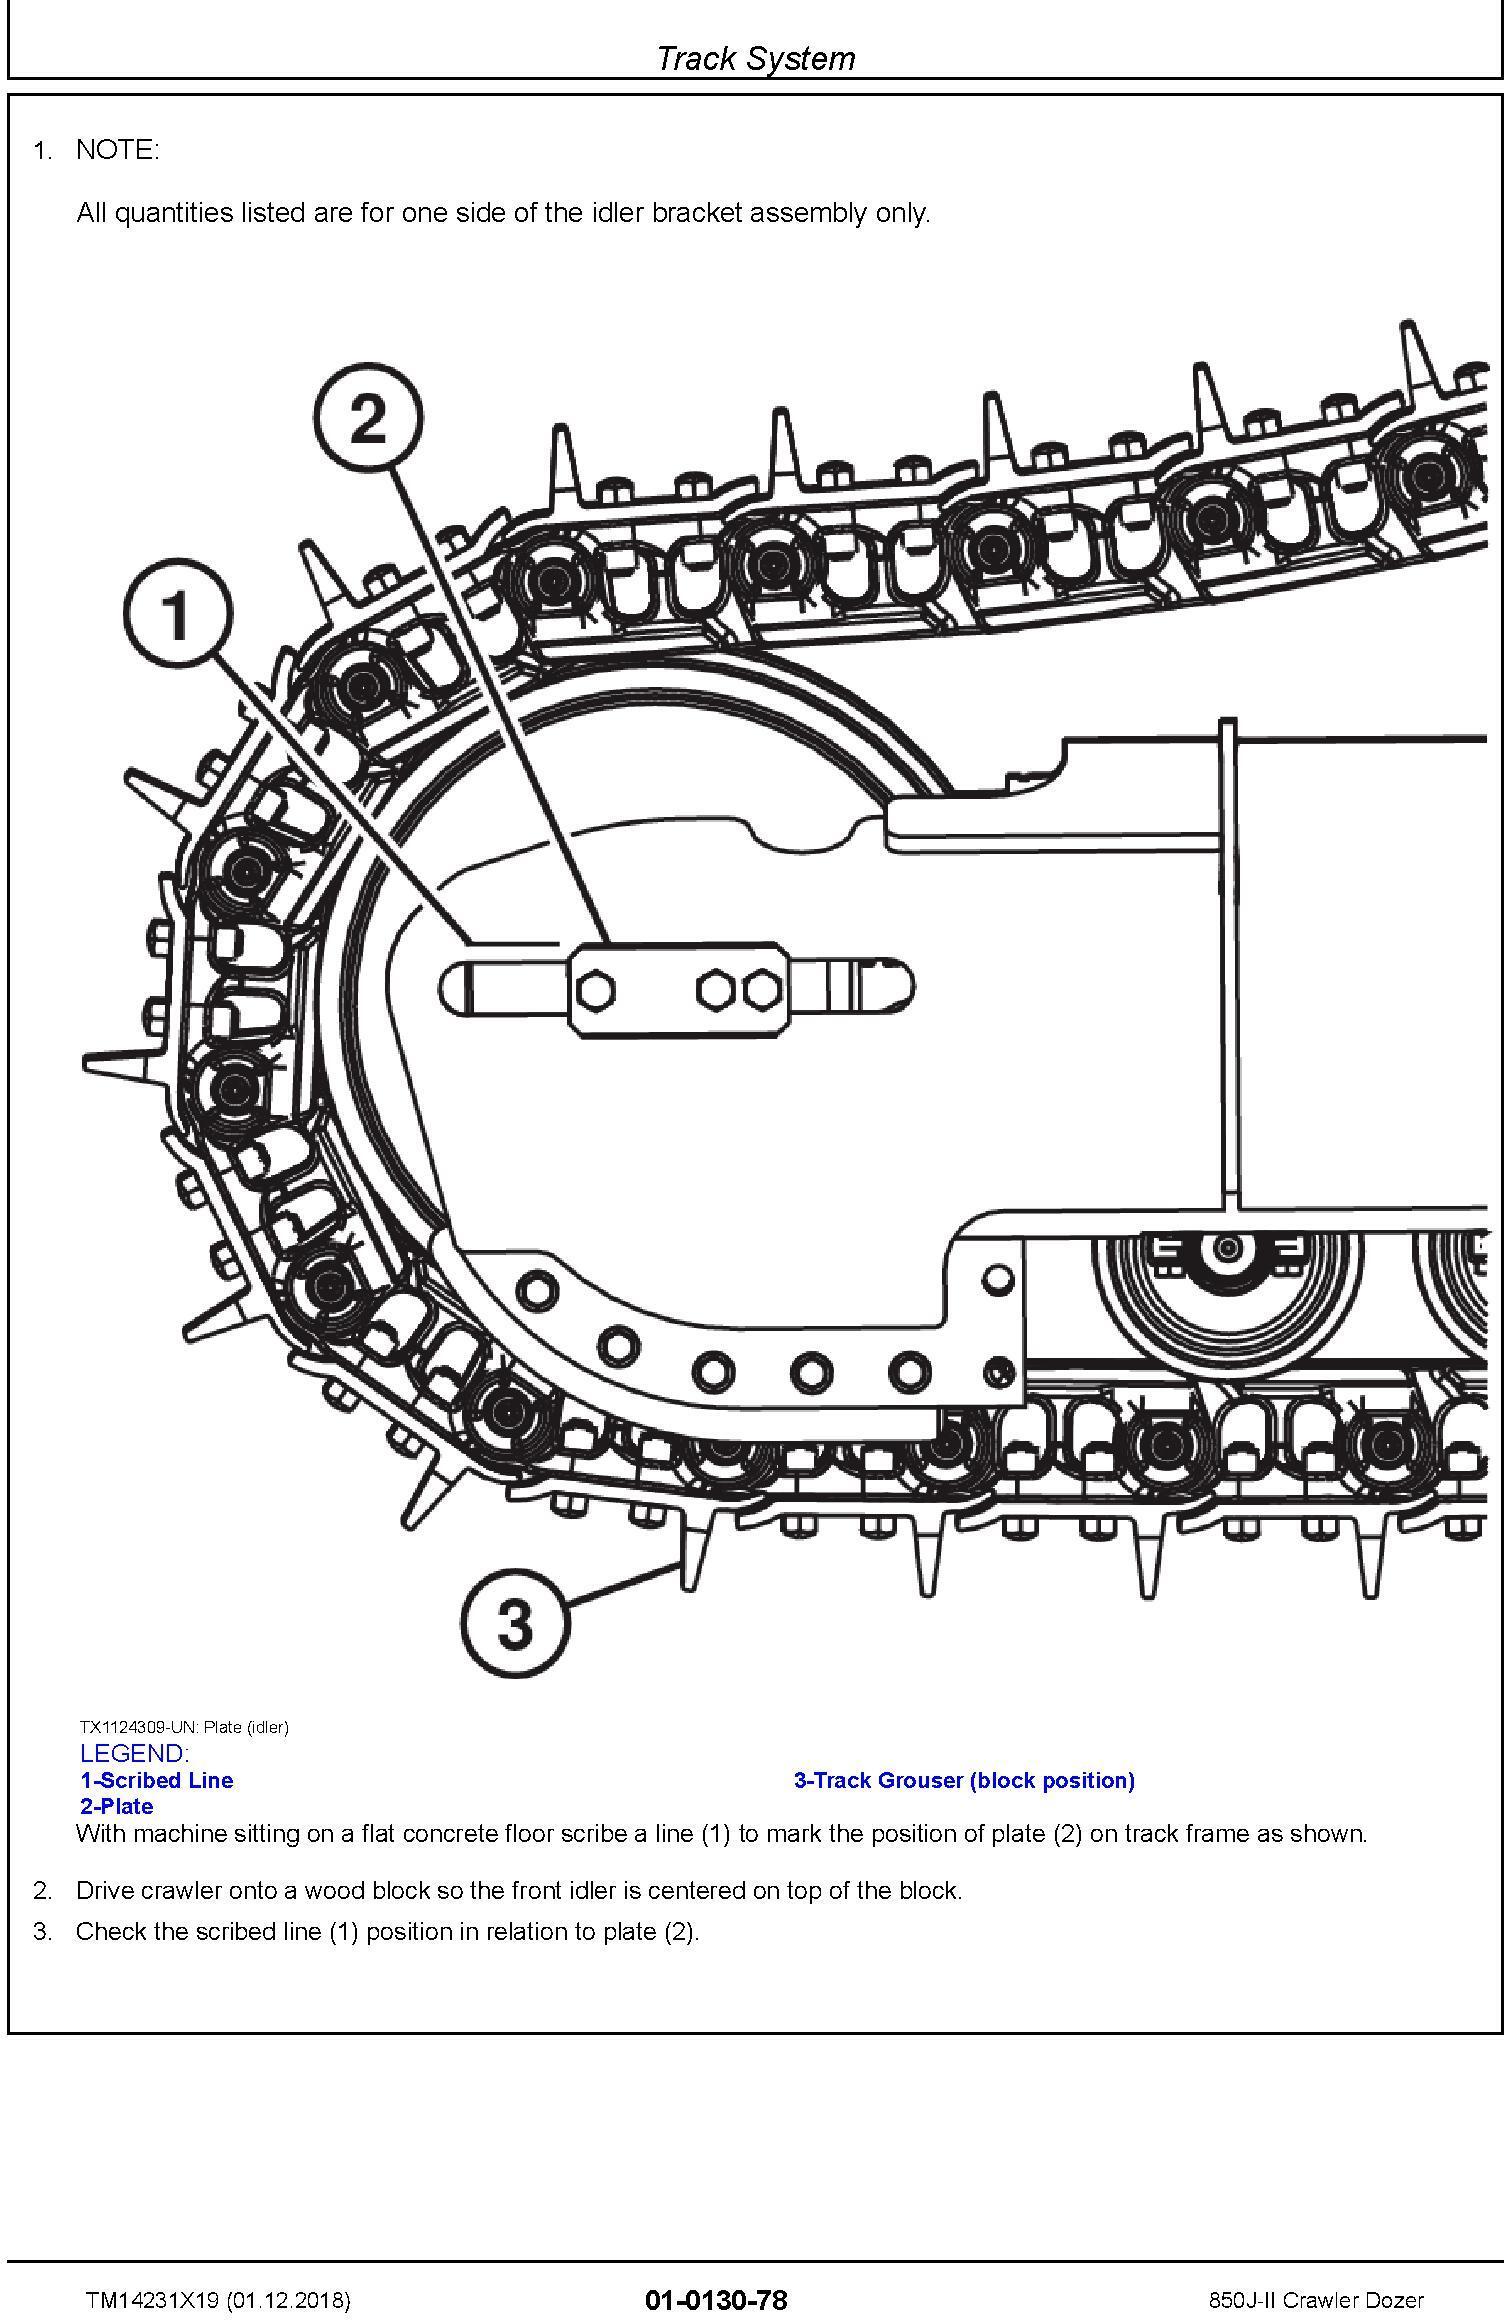 John Deere 850J-II (SN. D306725-323043) Crawler Dozer Service Repair Technical Manual (TM14231X19) - 3